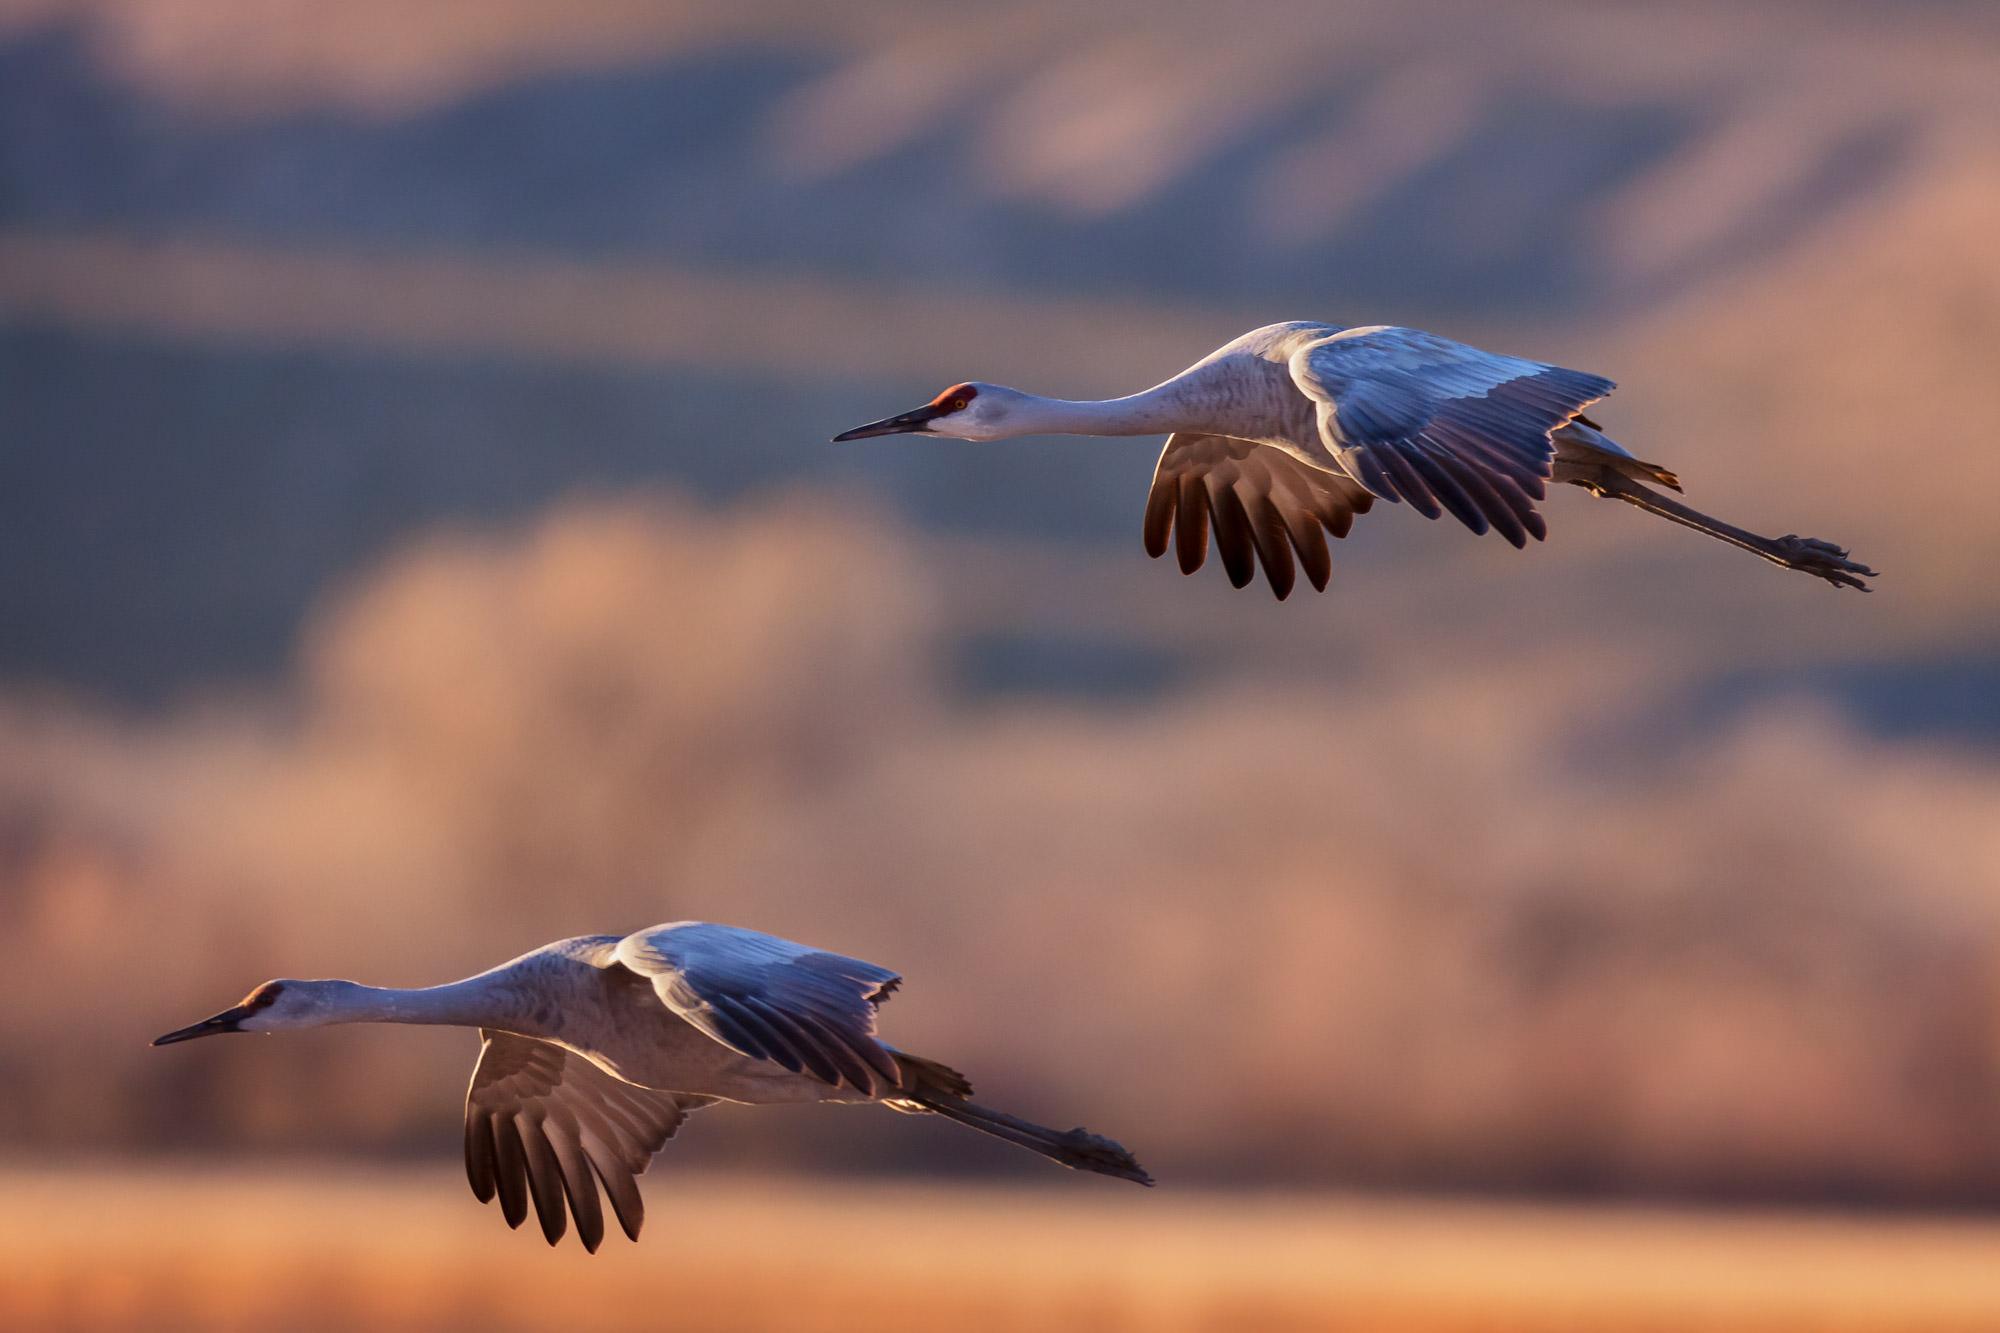 Sandhill Crane, New Mexico, Bosque del Apache, flying, limited edition, photograph, fine art, wildlife, photo